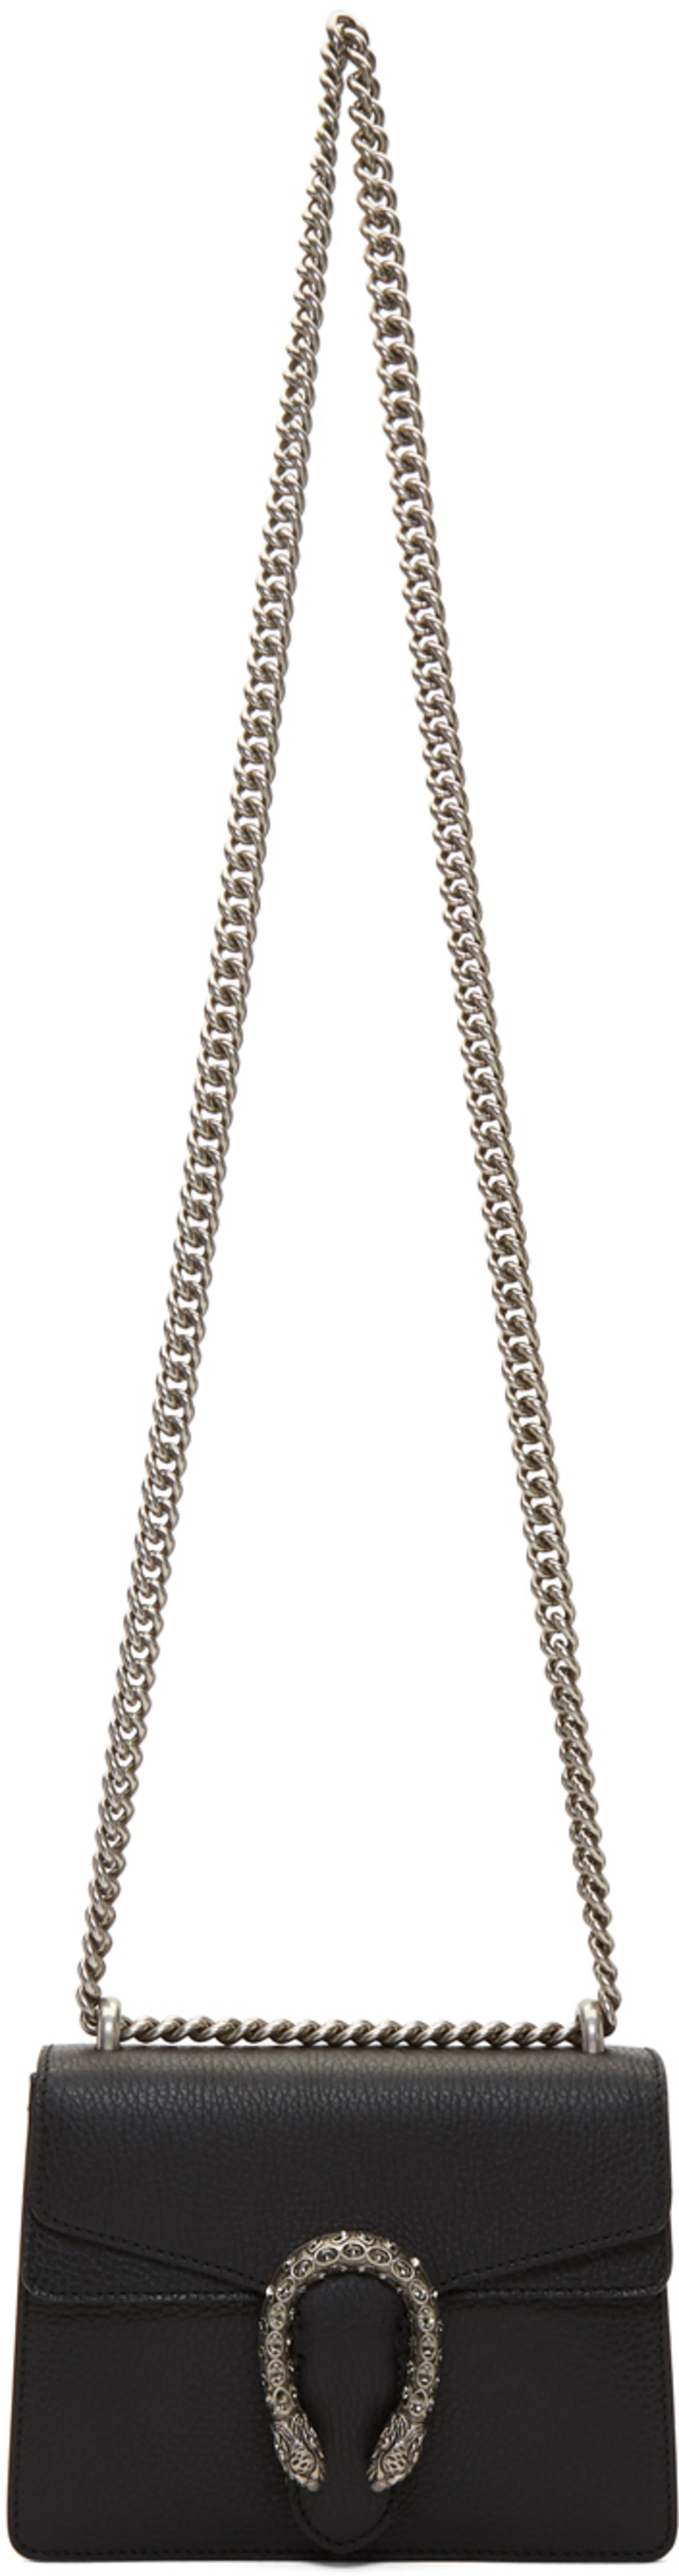 e0fea90904d Gucci bags for Women